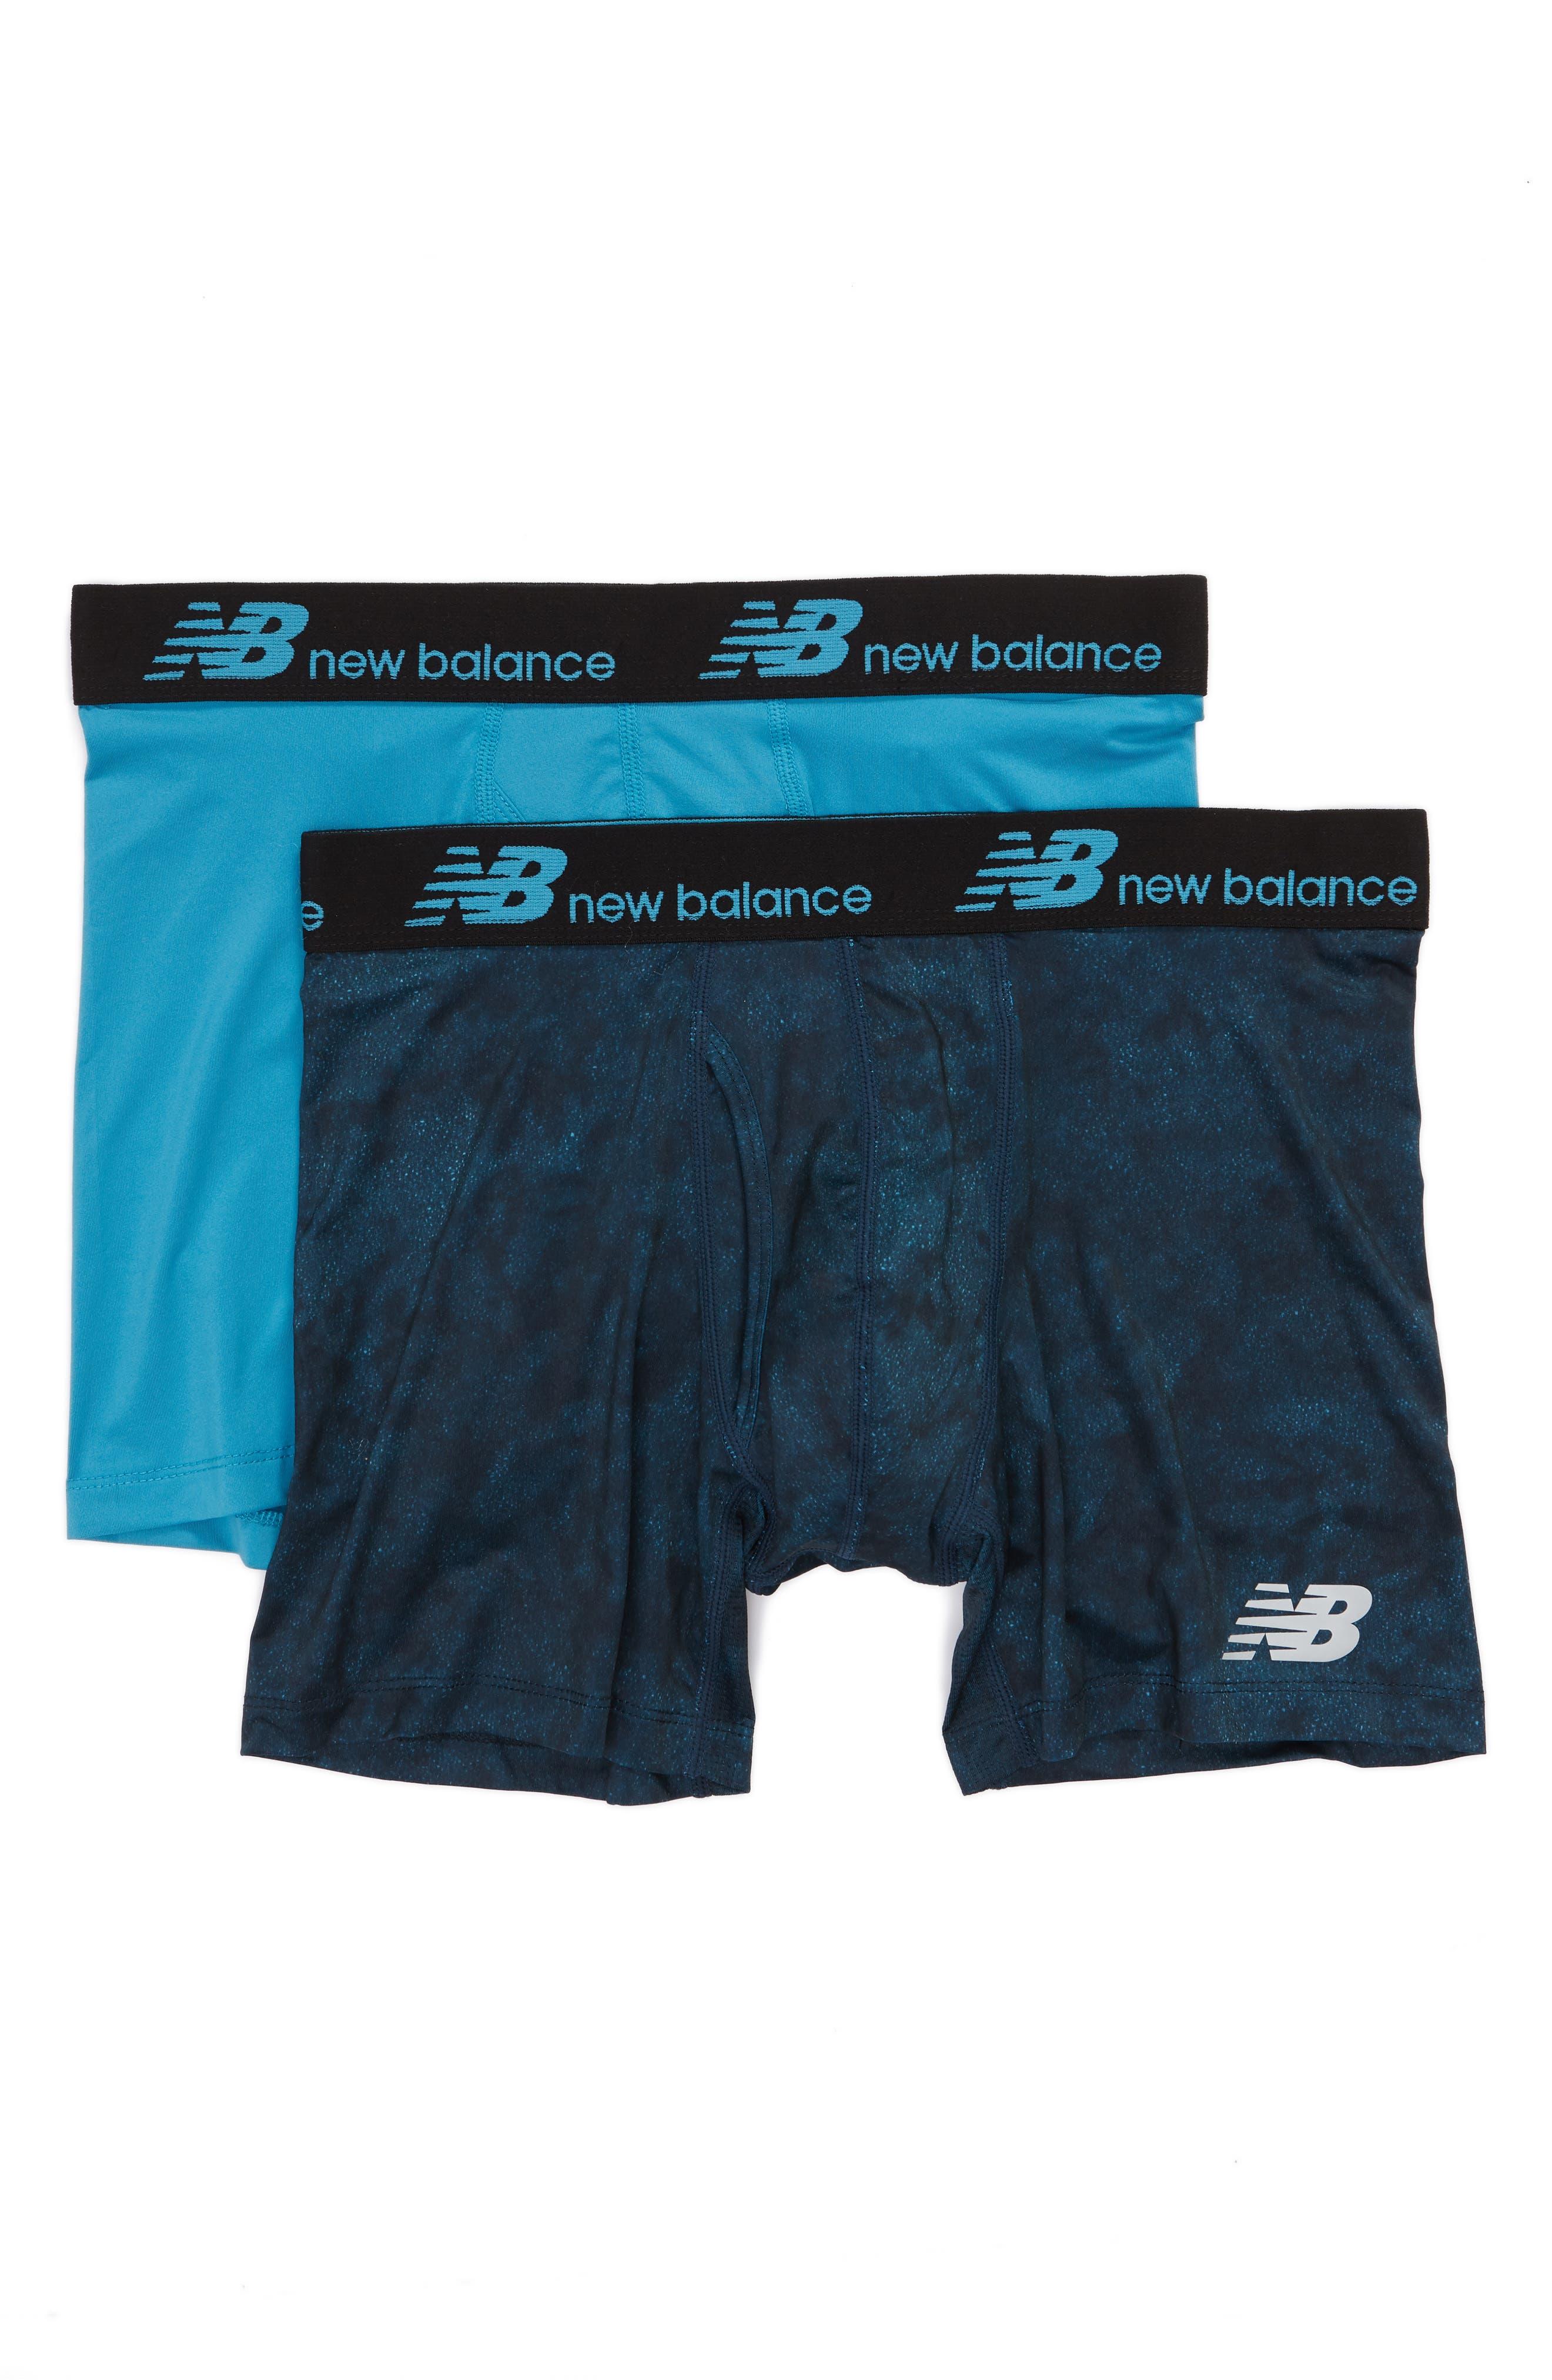 New Balance 2-Pack Boxer Briefs, Blue